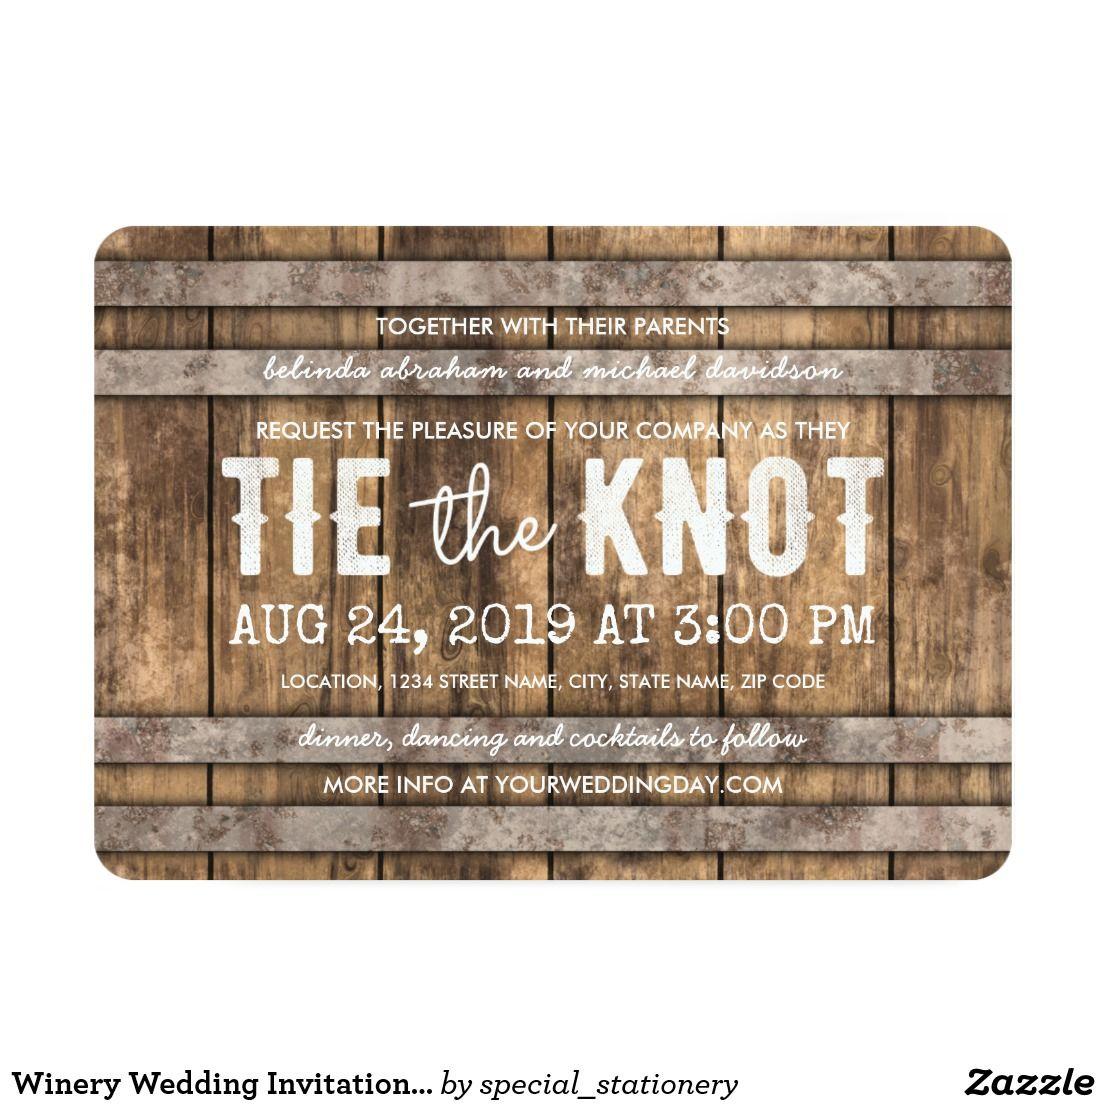 Winery Wedding Invitation Rustic Wooden Barrel Winery Wedding